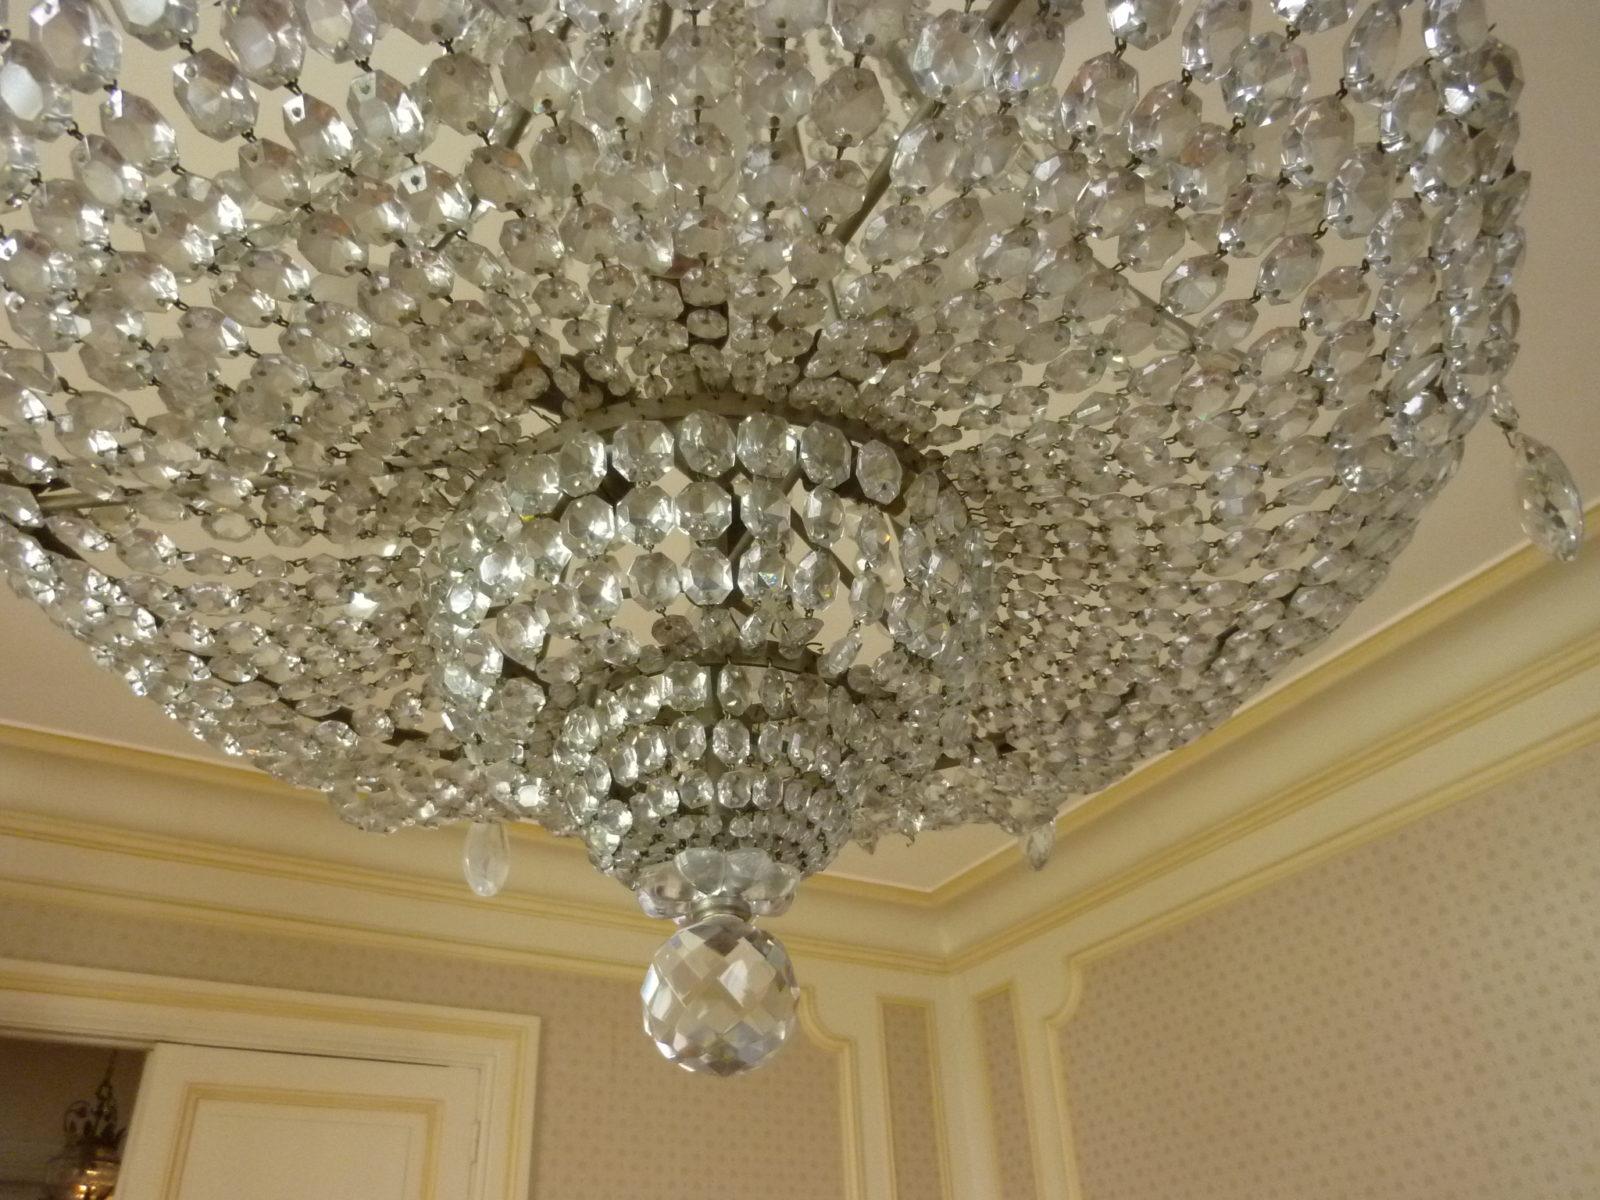 grand lustre corbeille cristal et bronze la licorne antiquit. Black Bedroom Furniture Sets. Home Design Ideas